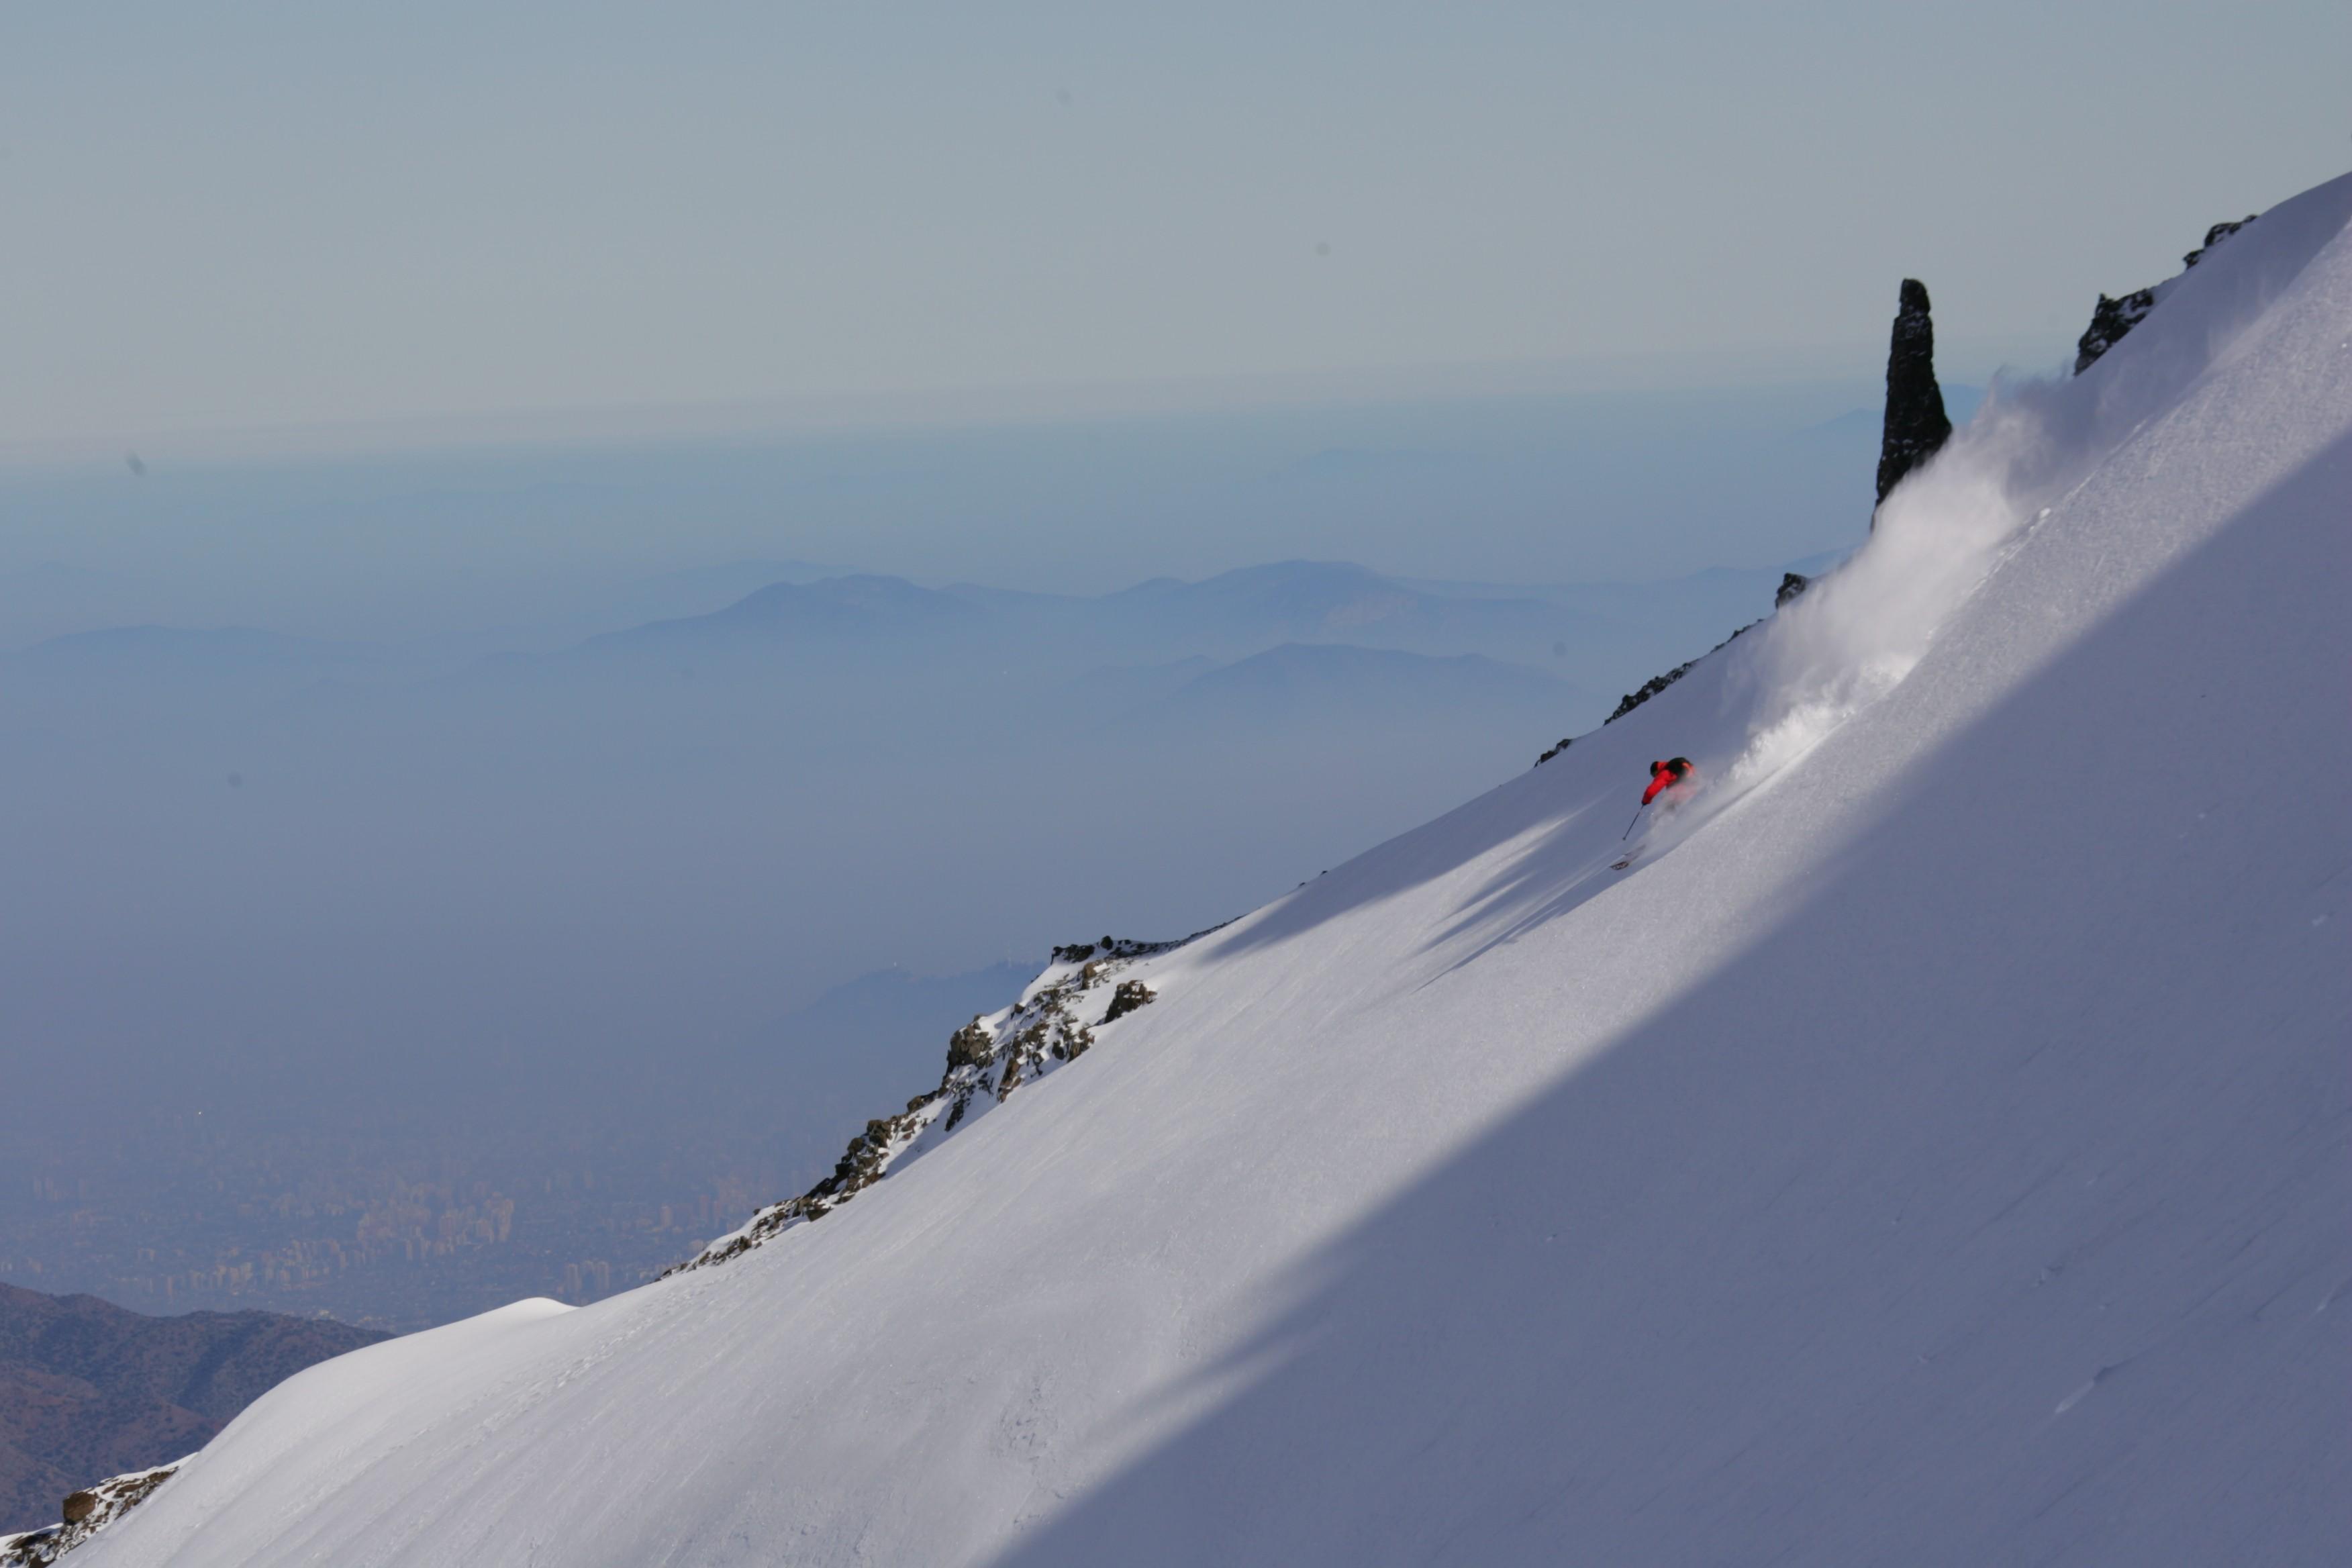 la-parva-montana-esqui-ski-nieve